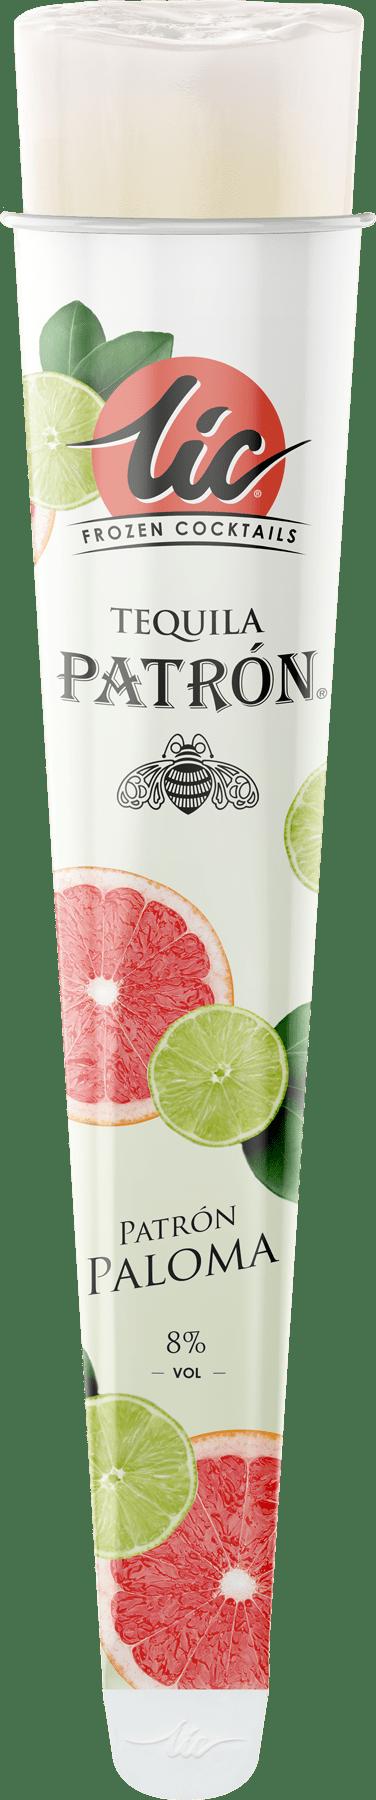 Patrón Tequila: Patrón Paloma